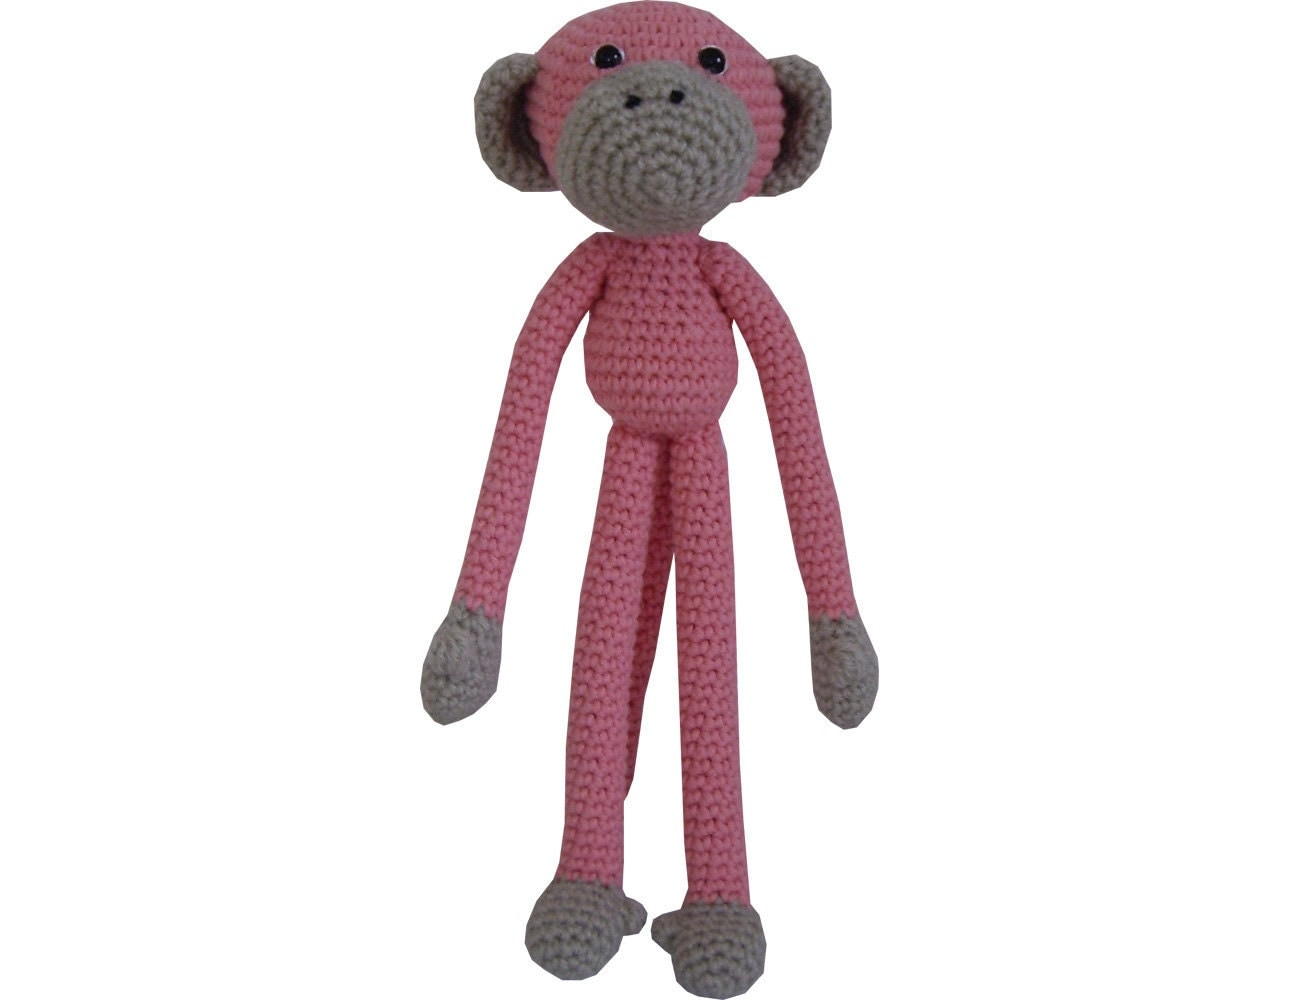 Amigurumi Glasses : Items similar to Amigurumi Crochet Pattern: Marty the ...